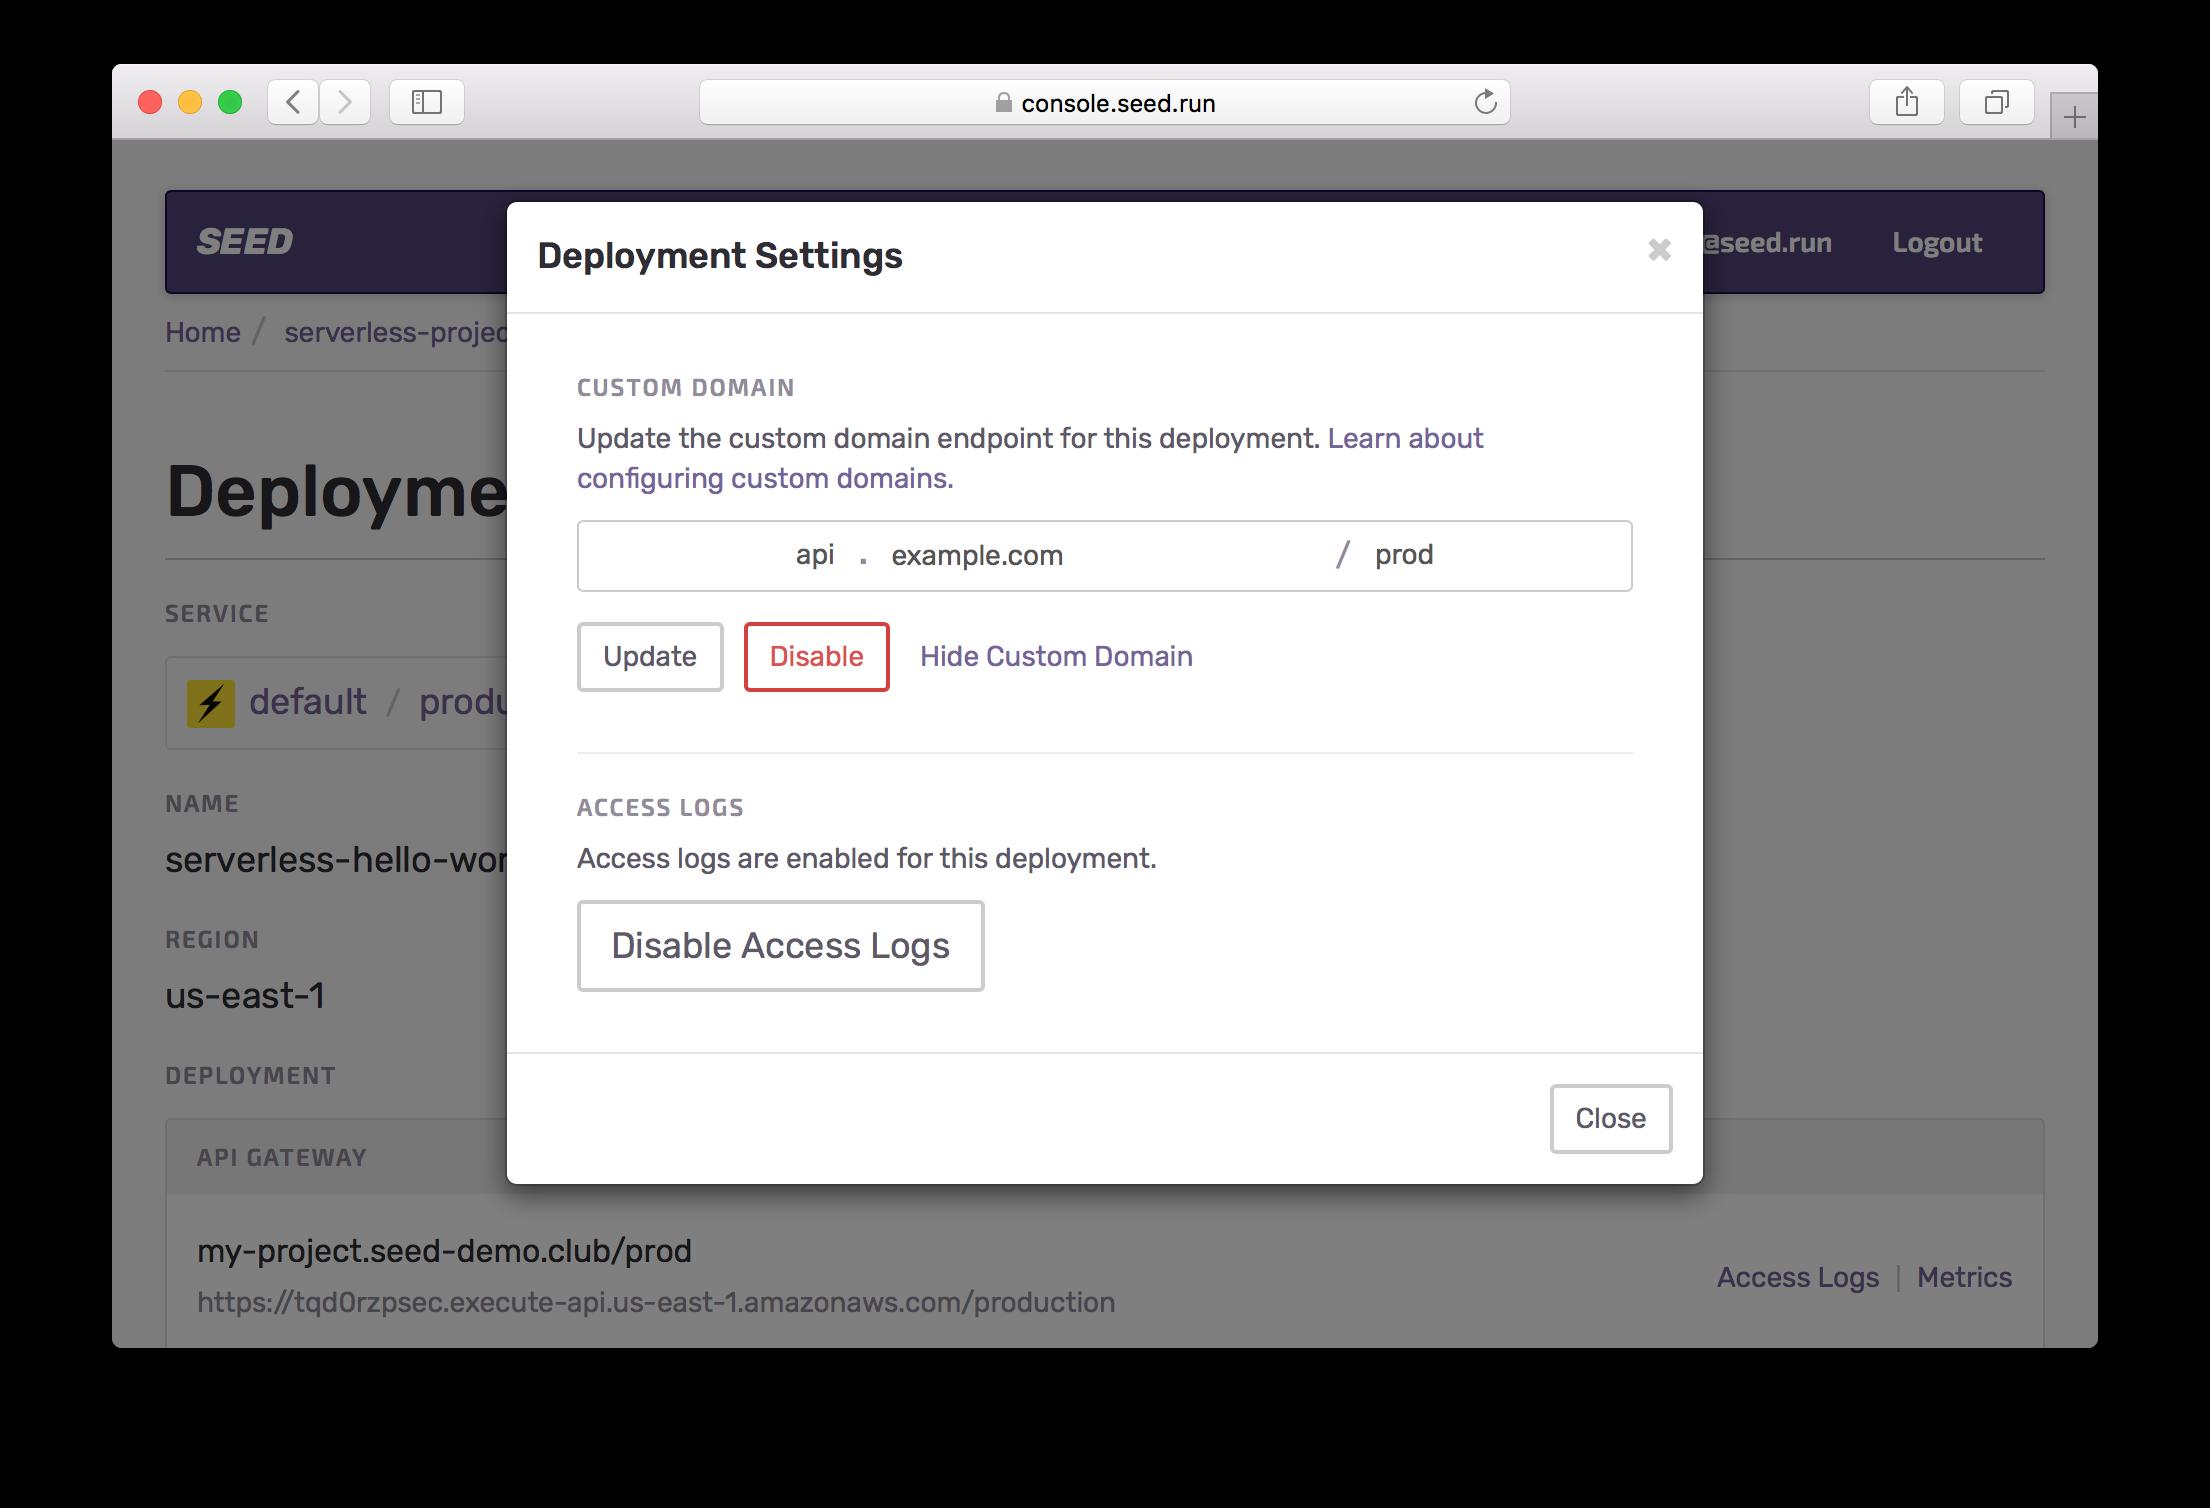 Disable Custom Domain Screenshot